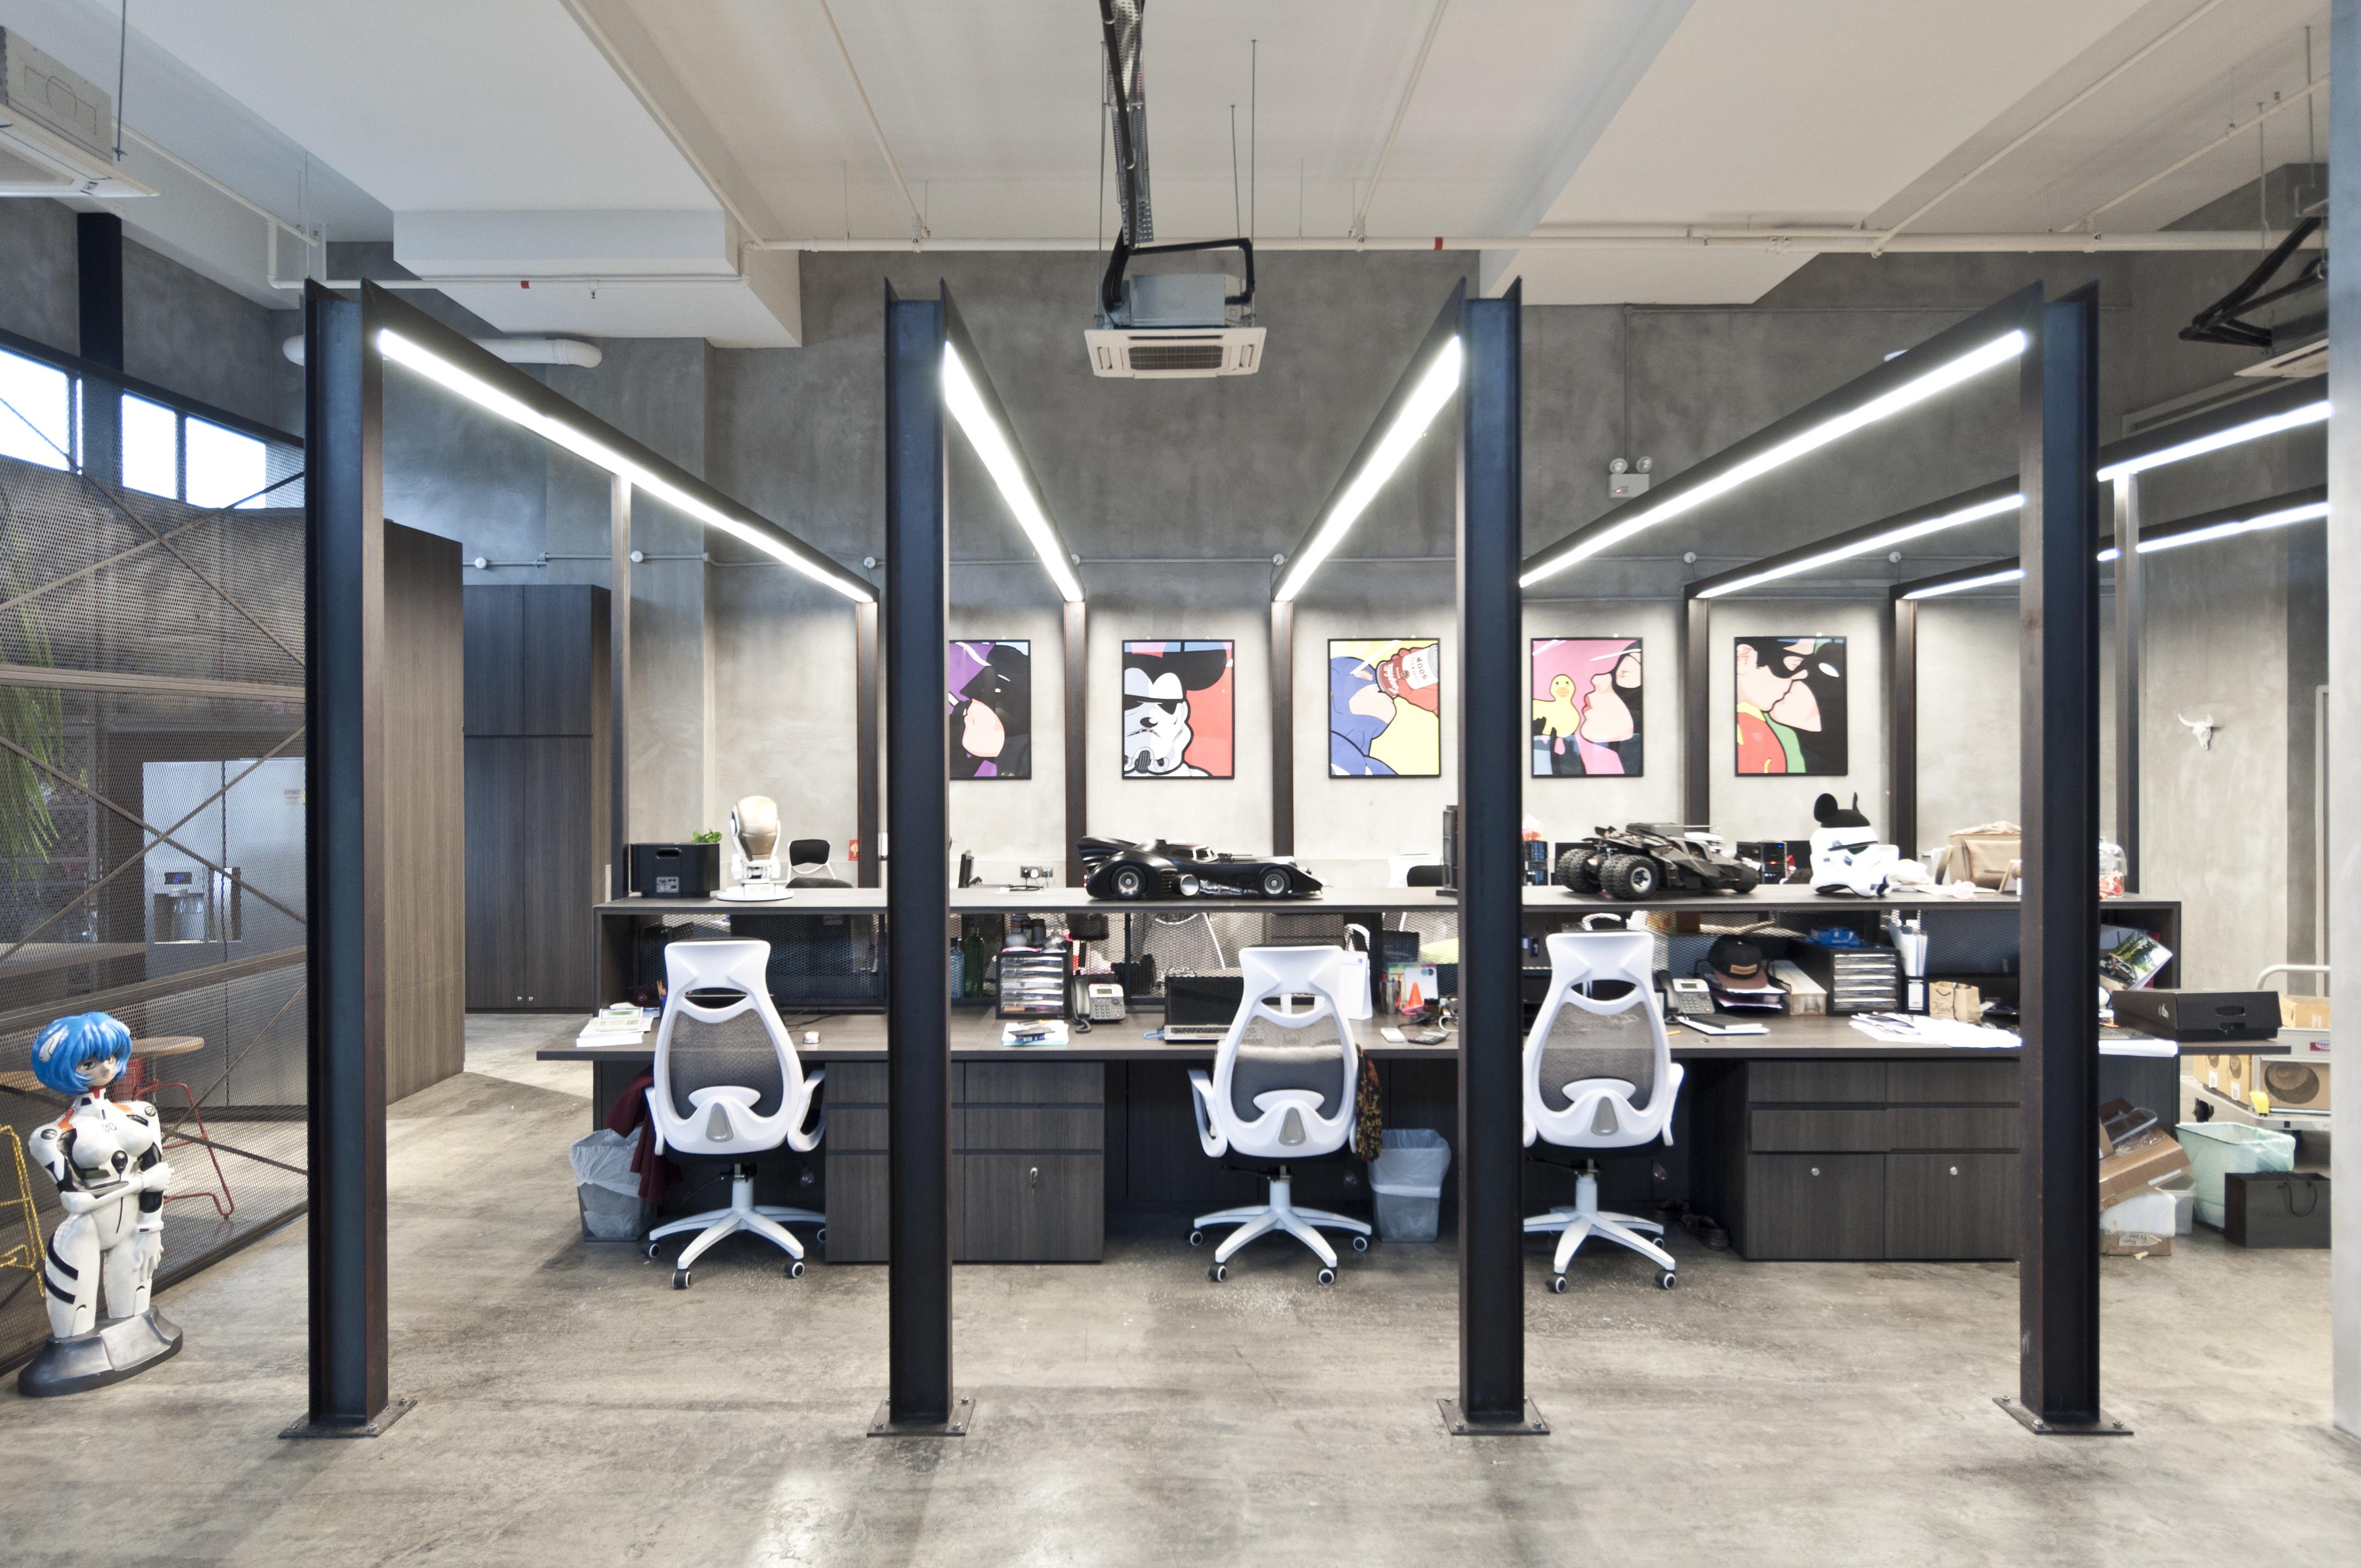 Procon Office